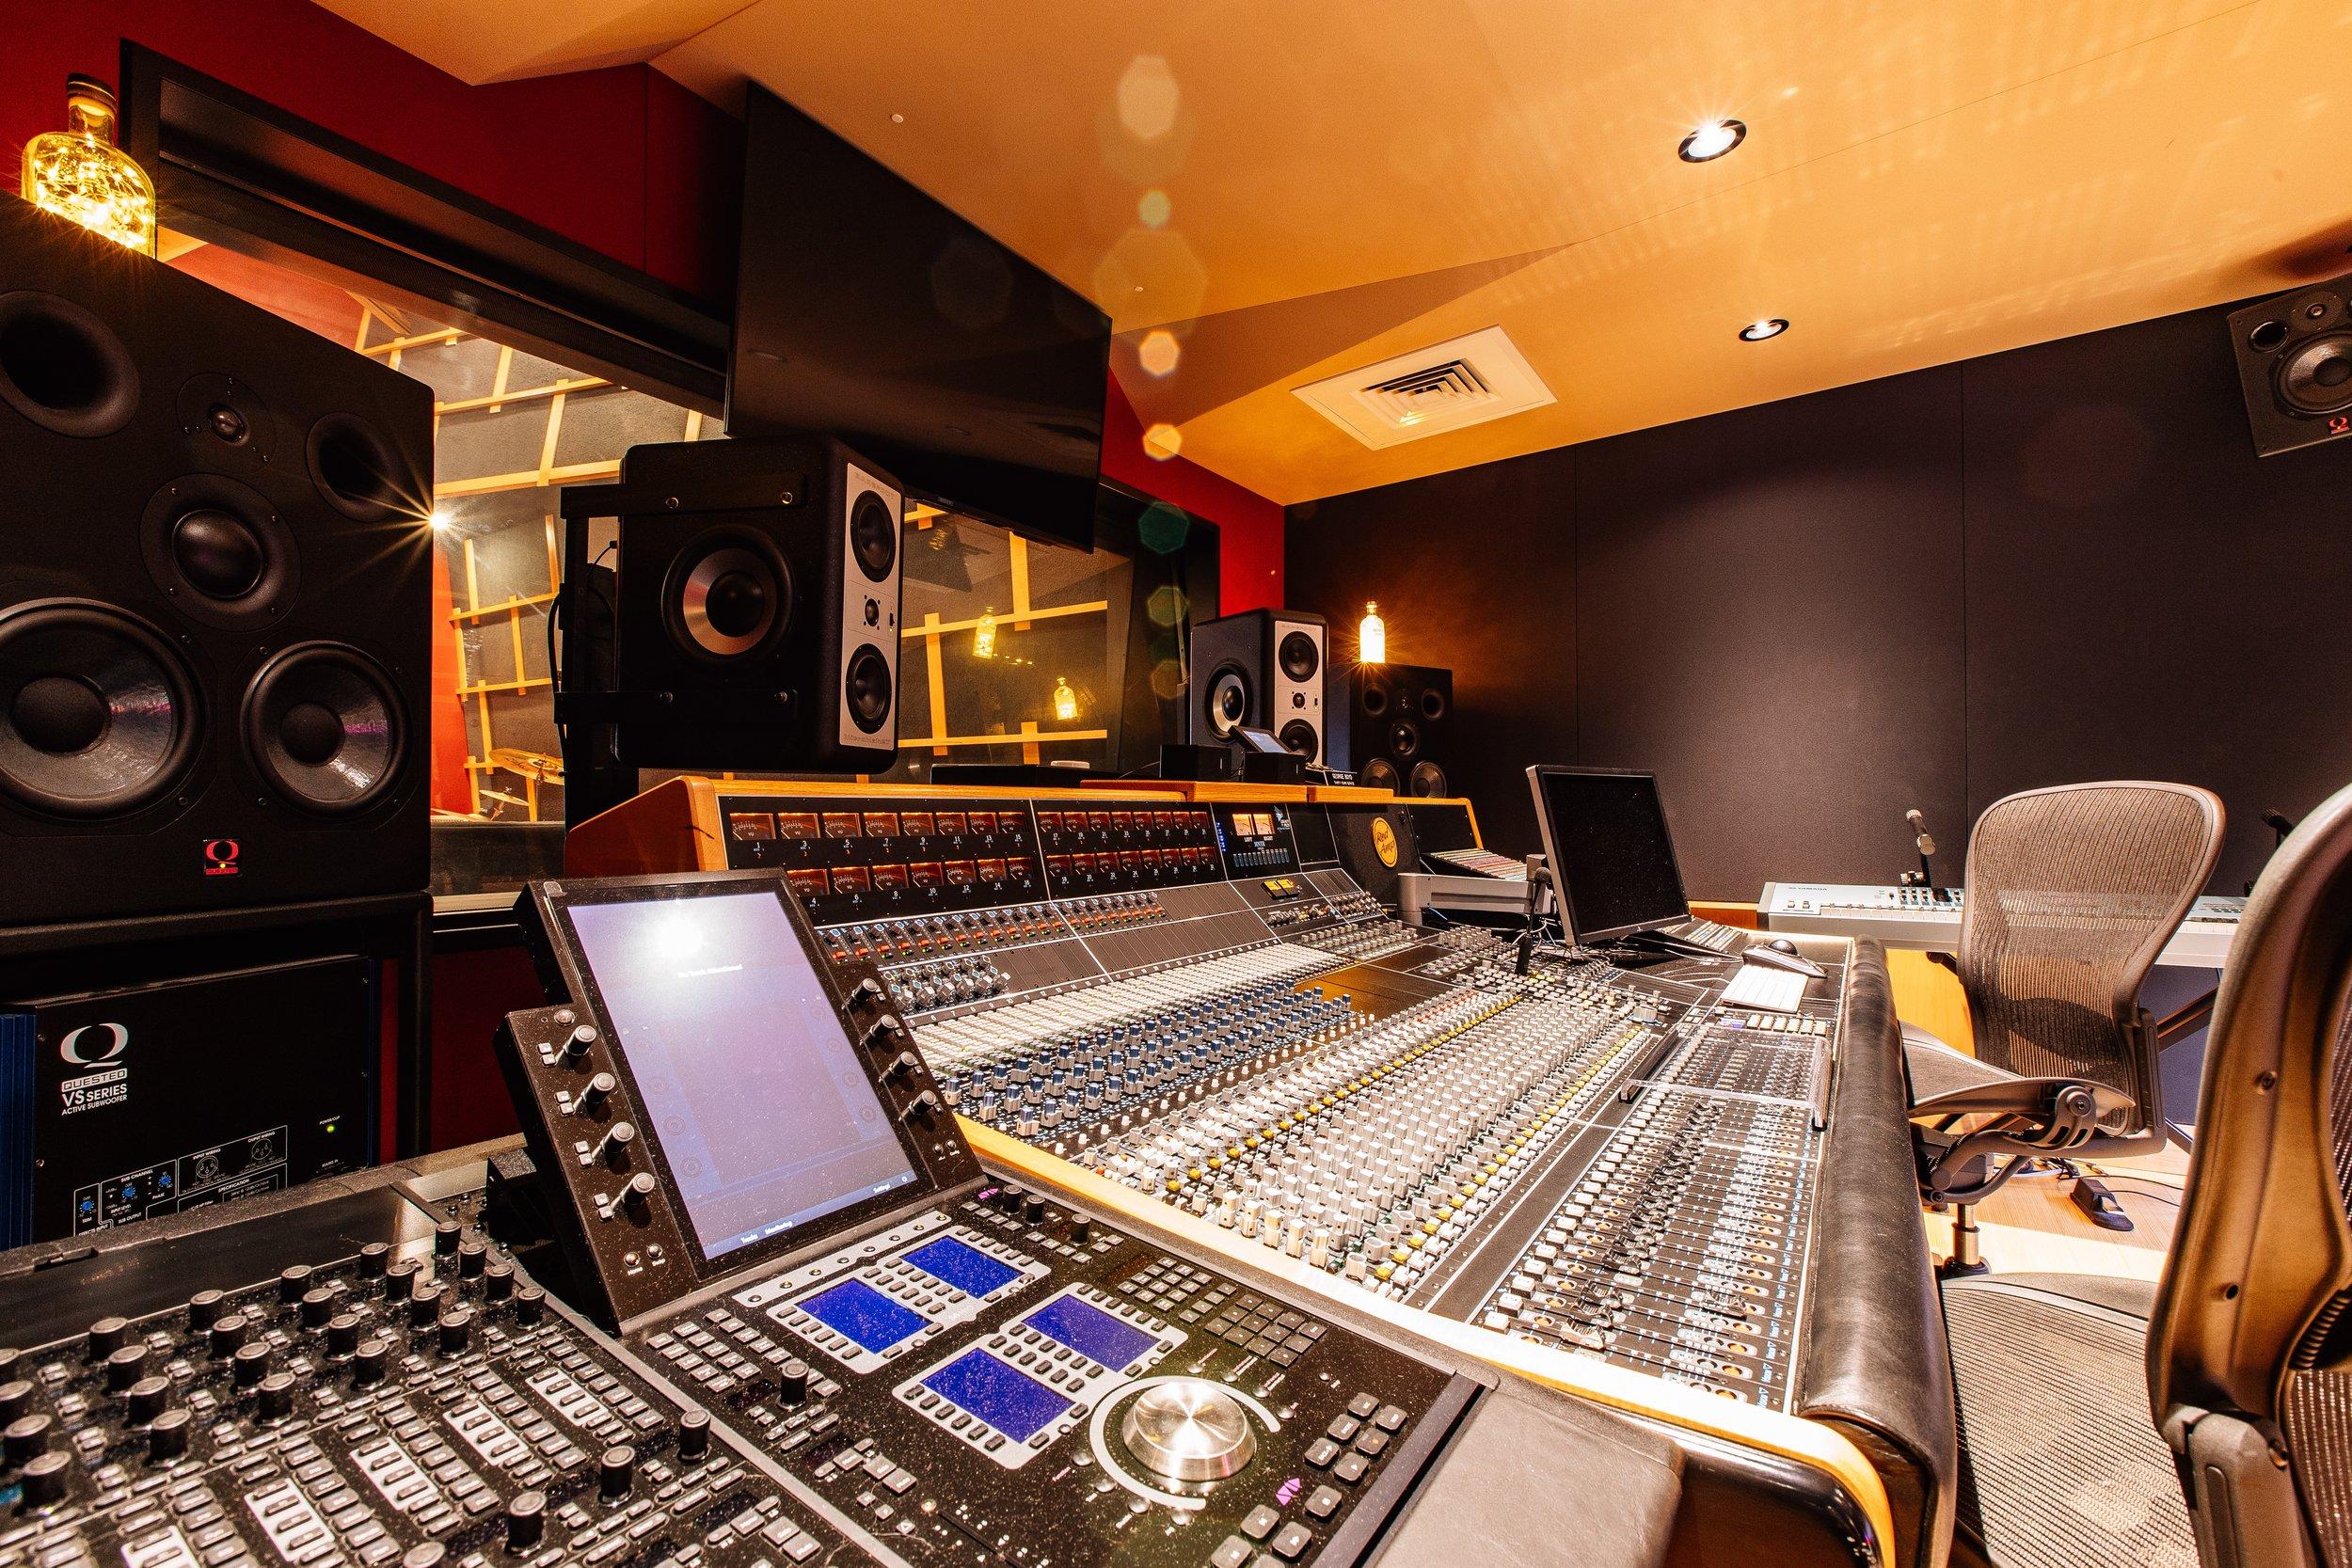 RedAmpAudio-Interiors-4_12.7MB.jpg